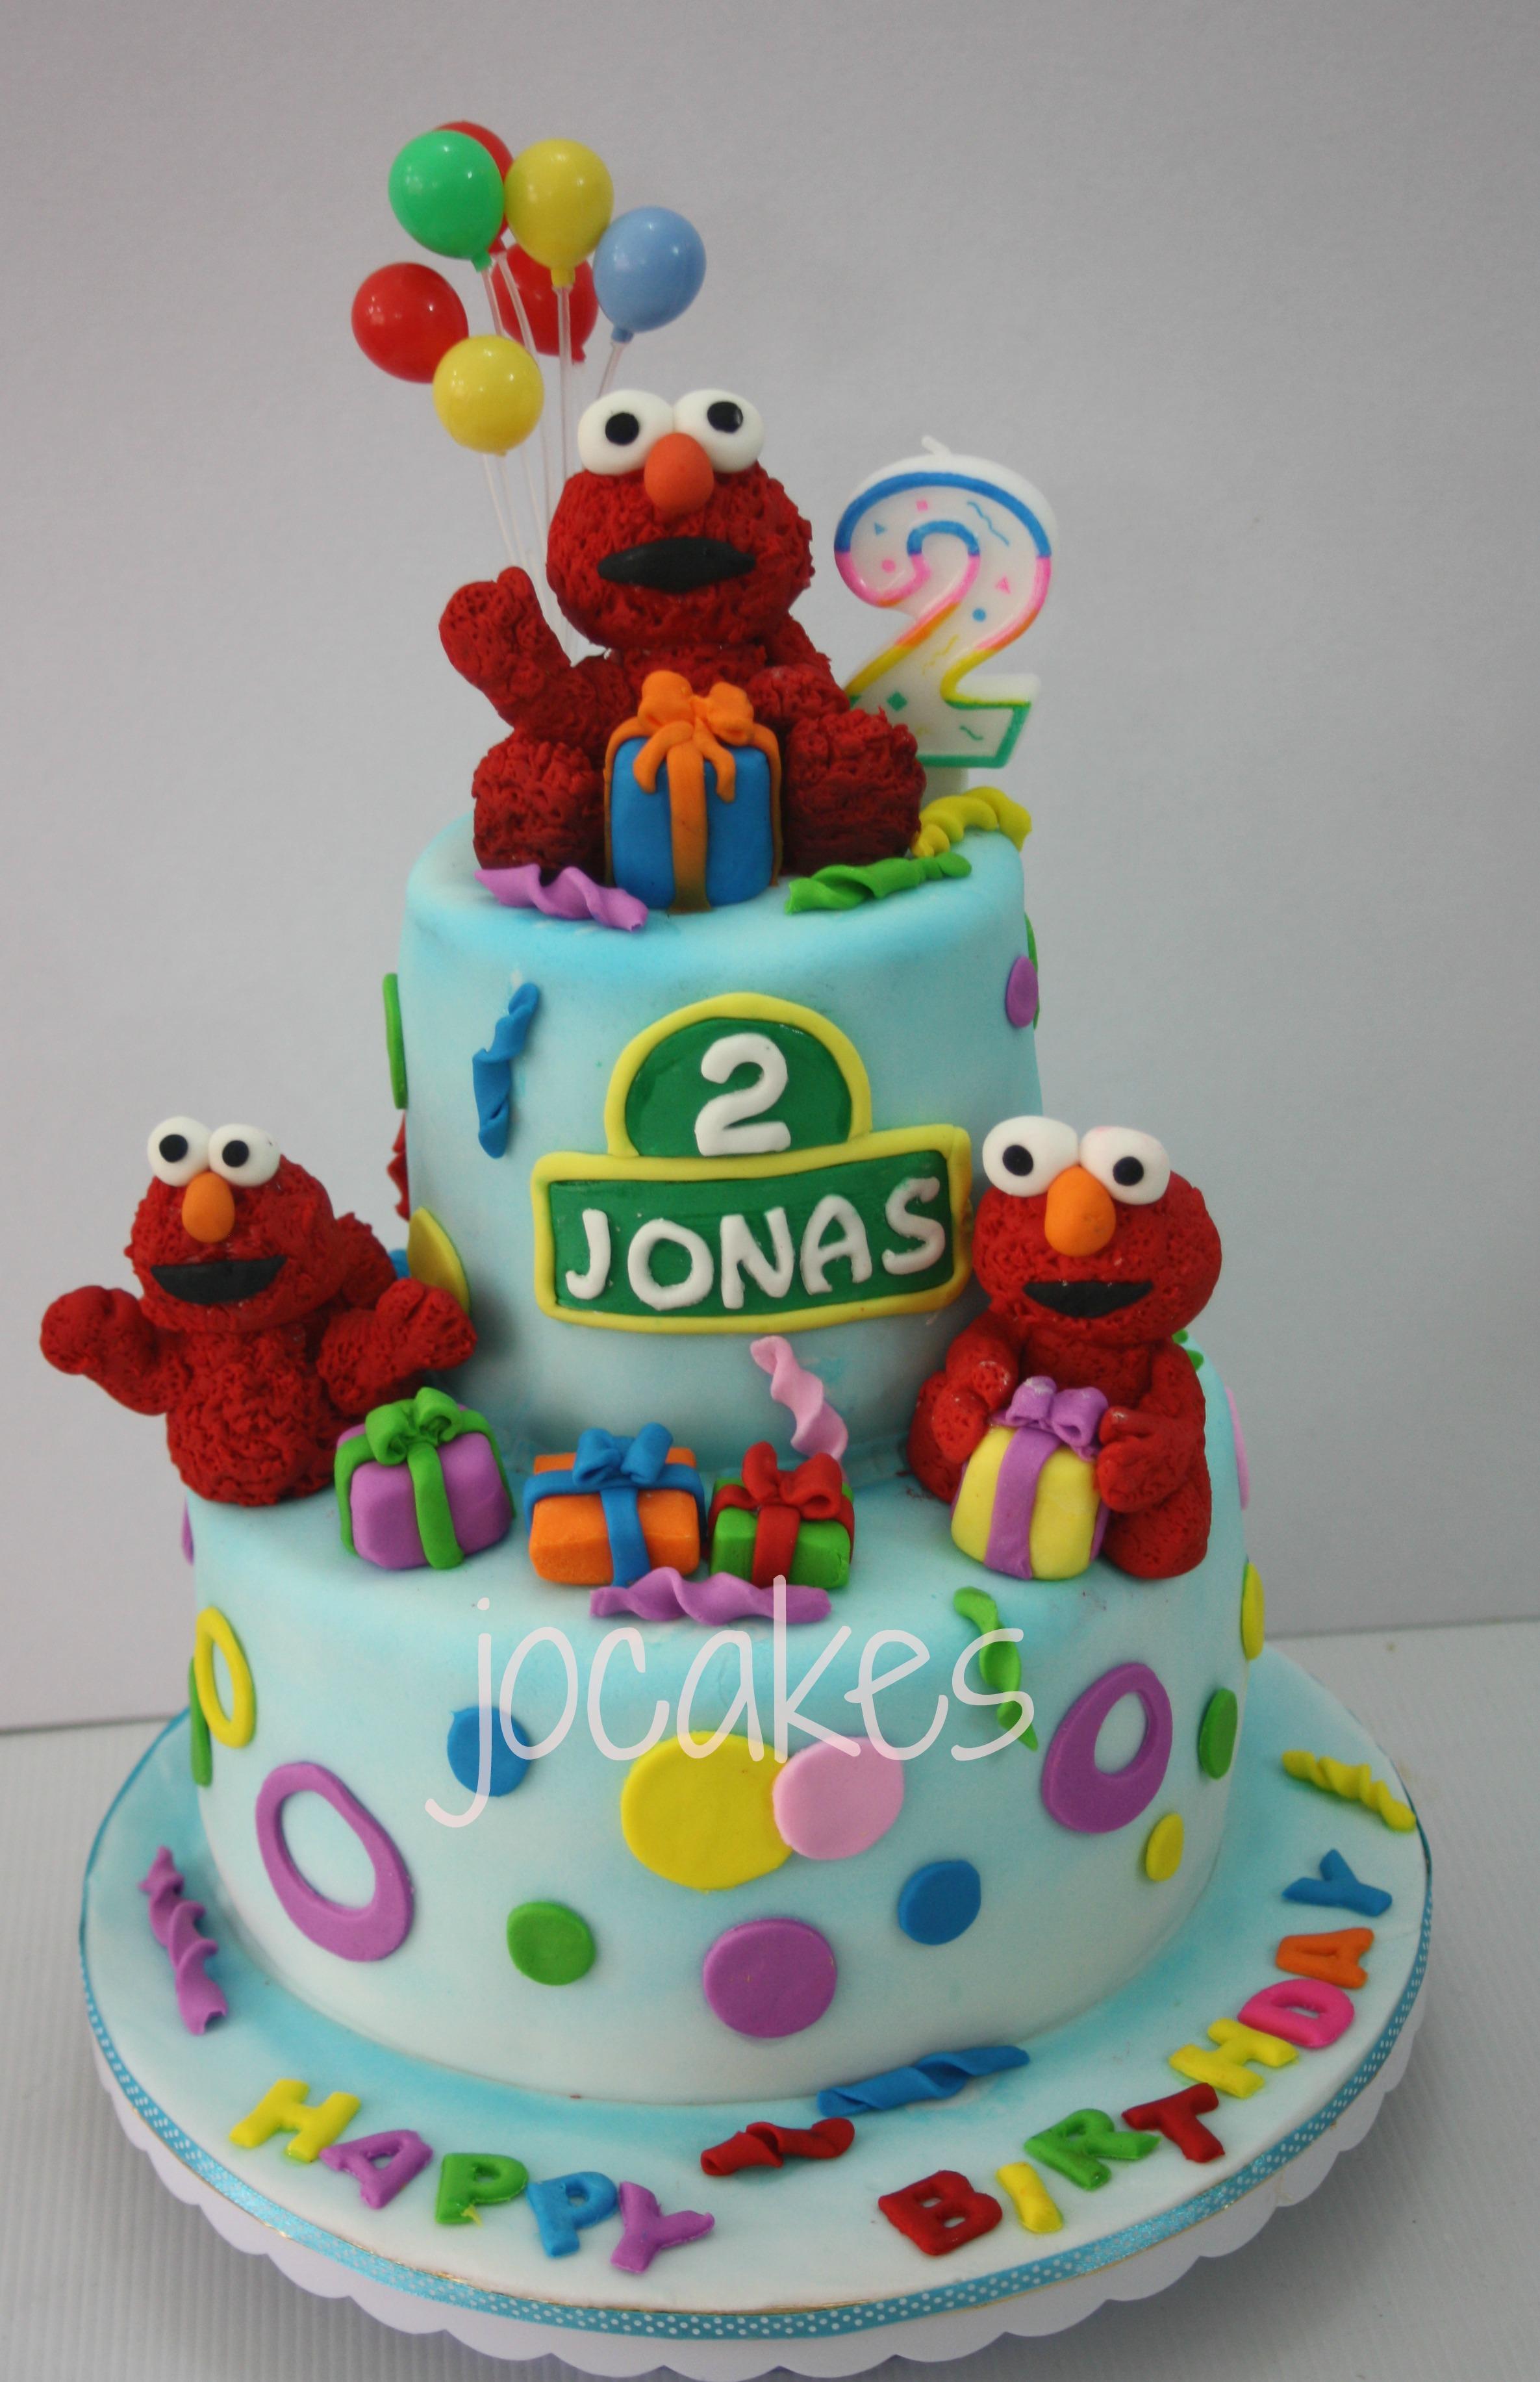 Phenomenal 6 Elmo Birthday Cakes For 2 Year Old Boys Photo 2 Year Old Boy Birthday Cards Printable Riciscafe Filternl